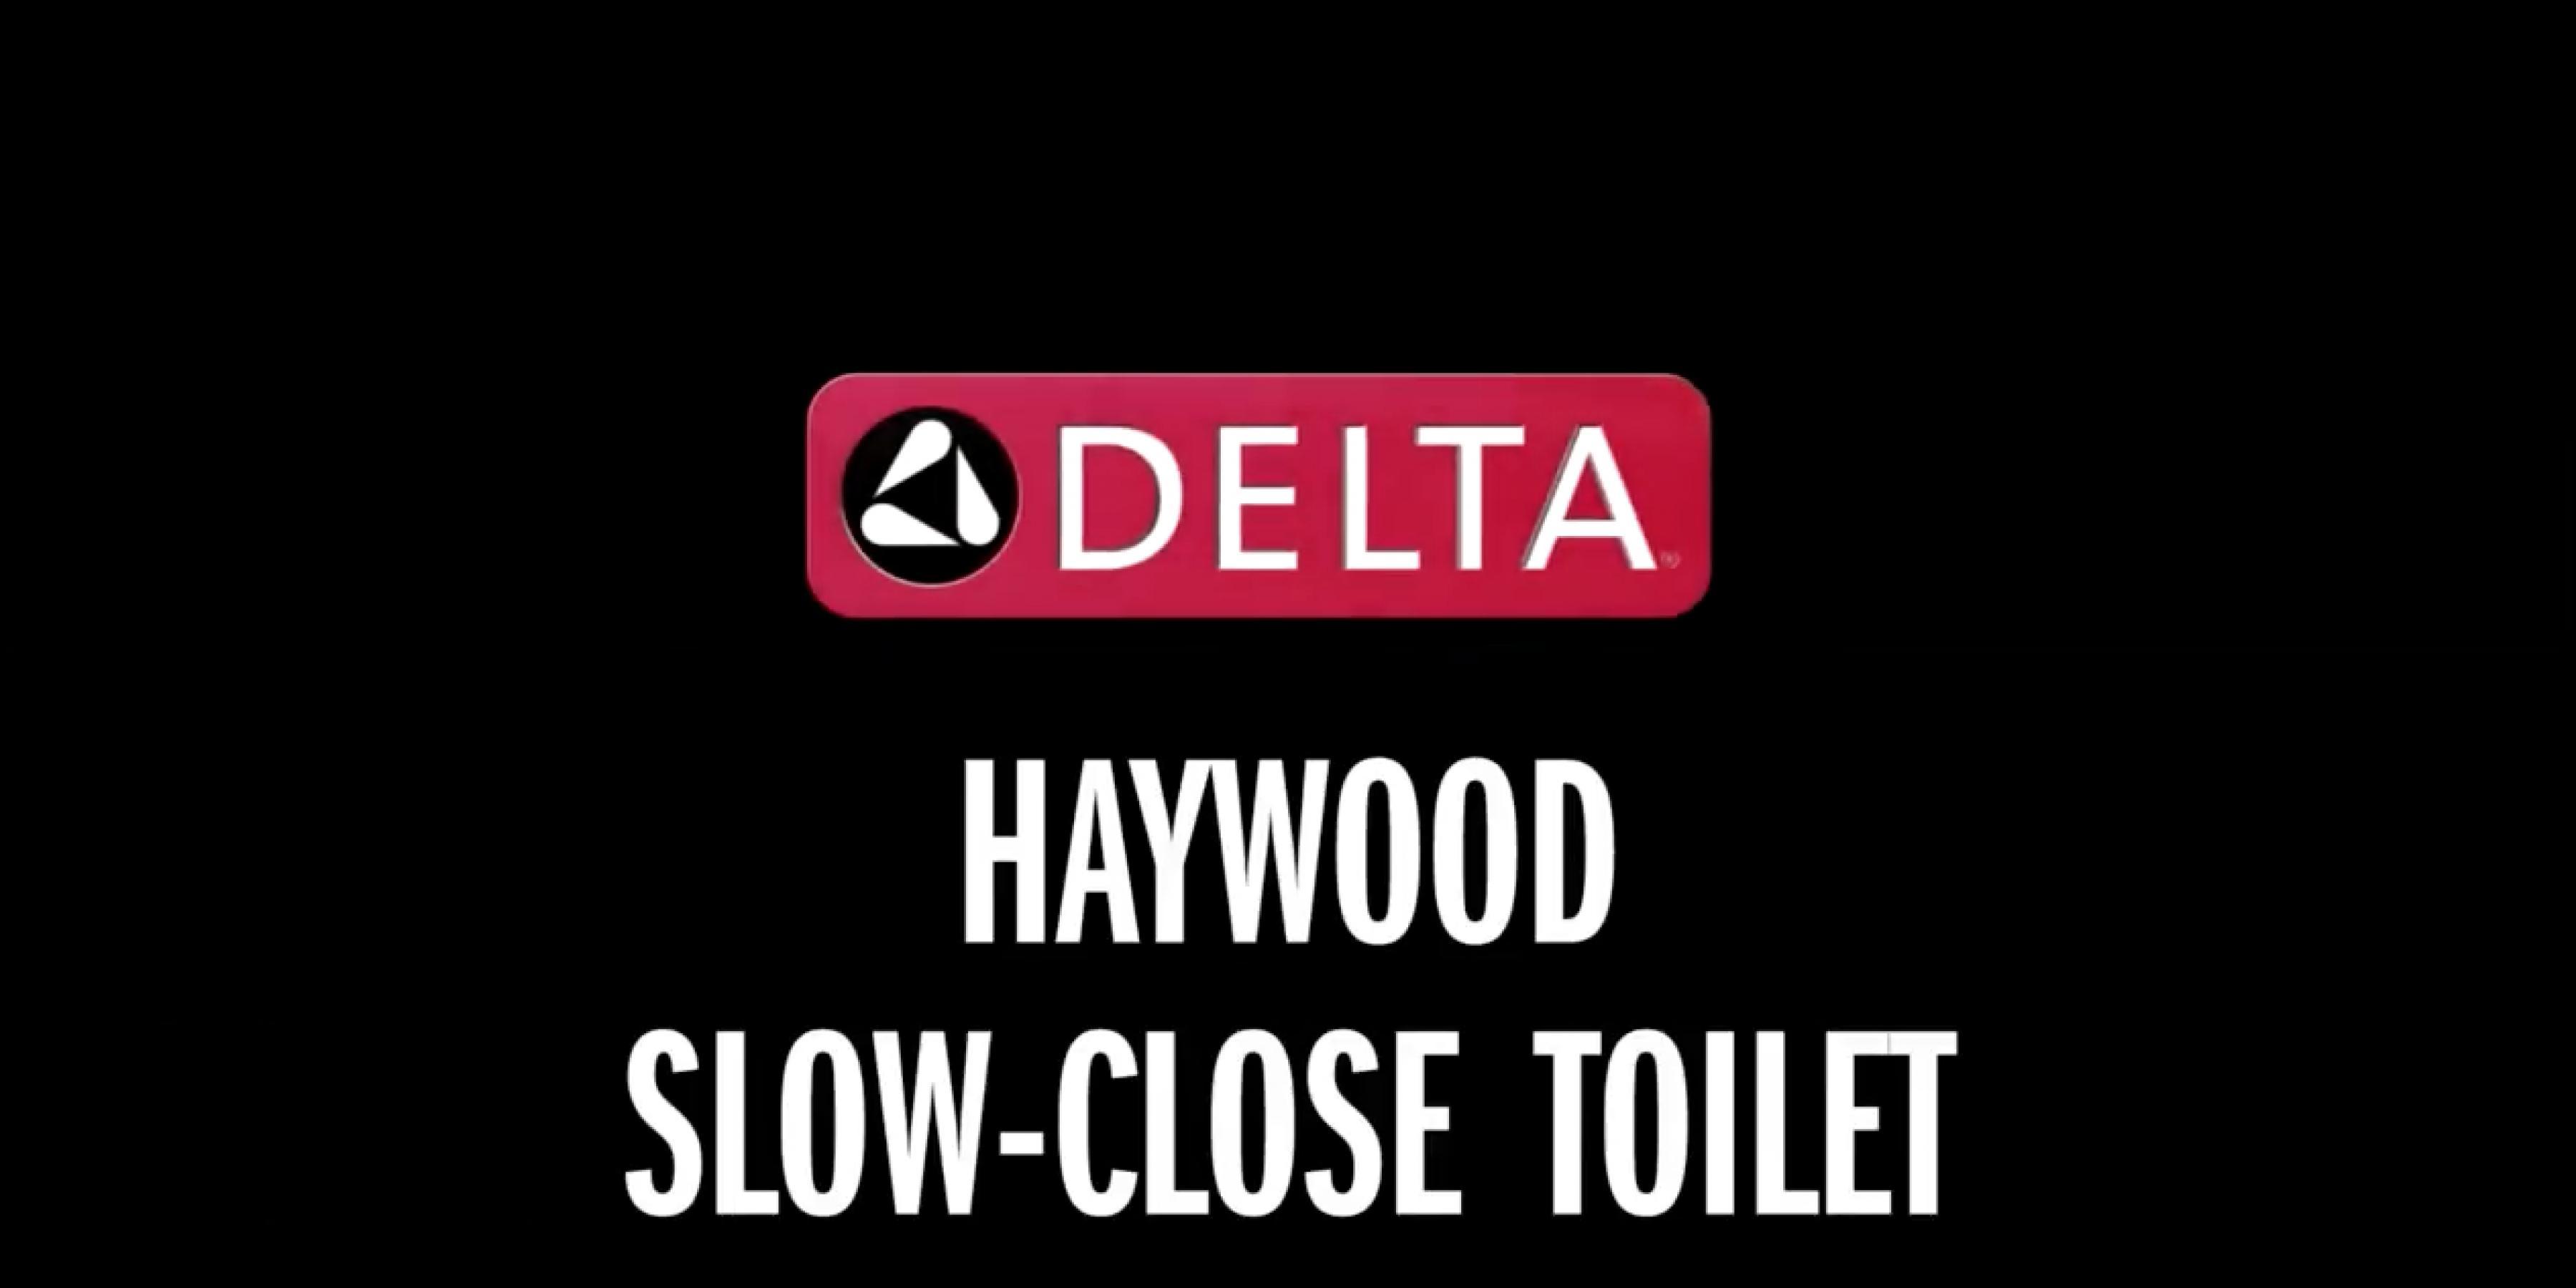 Haywood™ Slow-Close Toilet